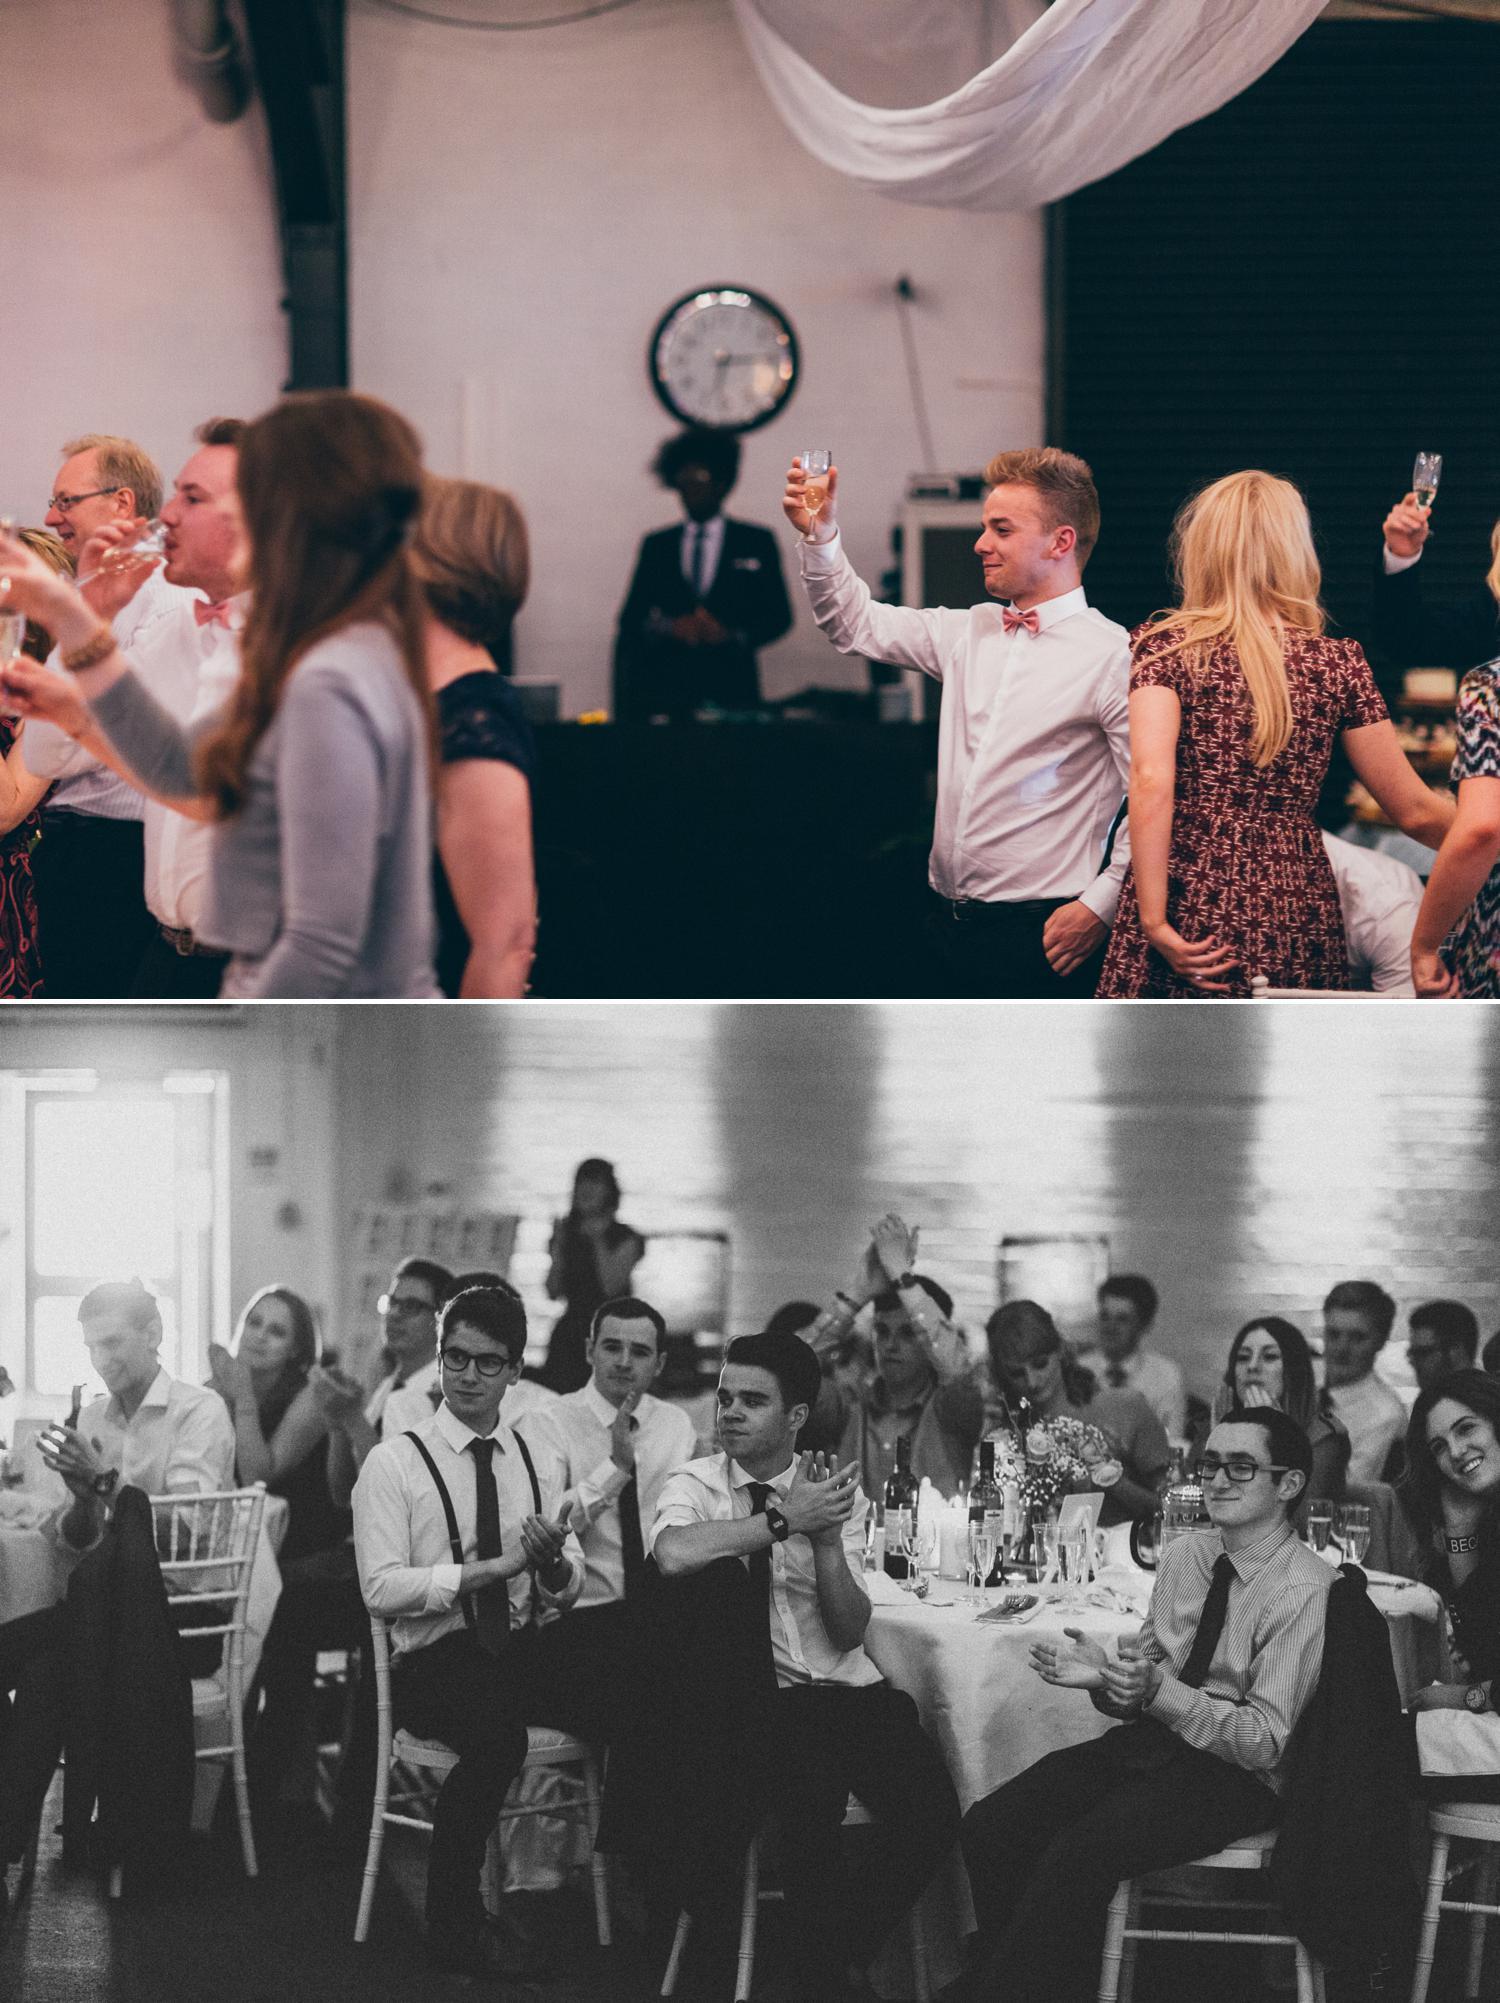 128-informal-wedding-photography.jpg